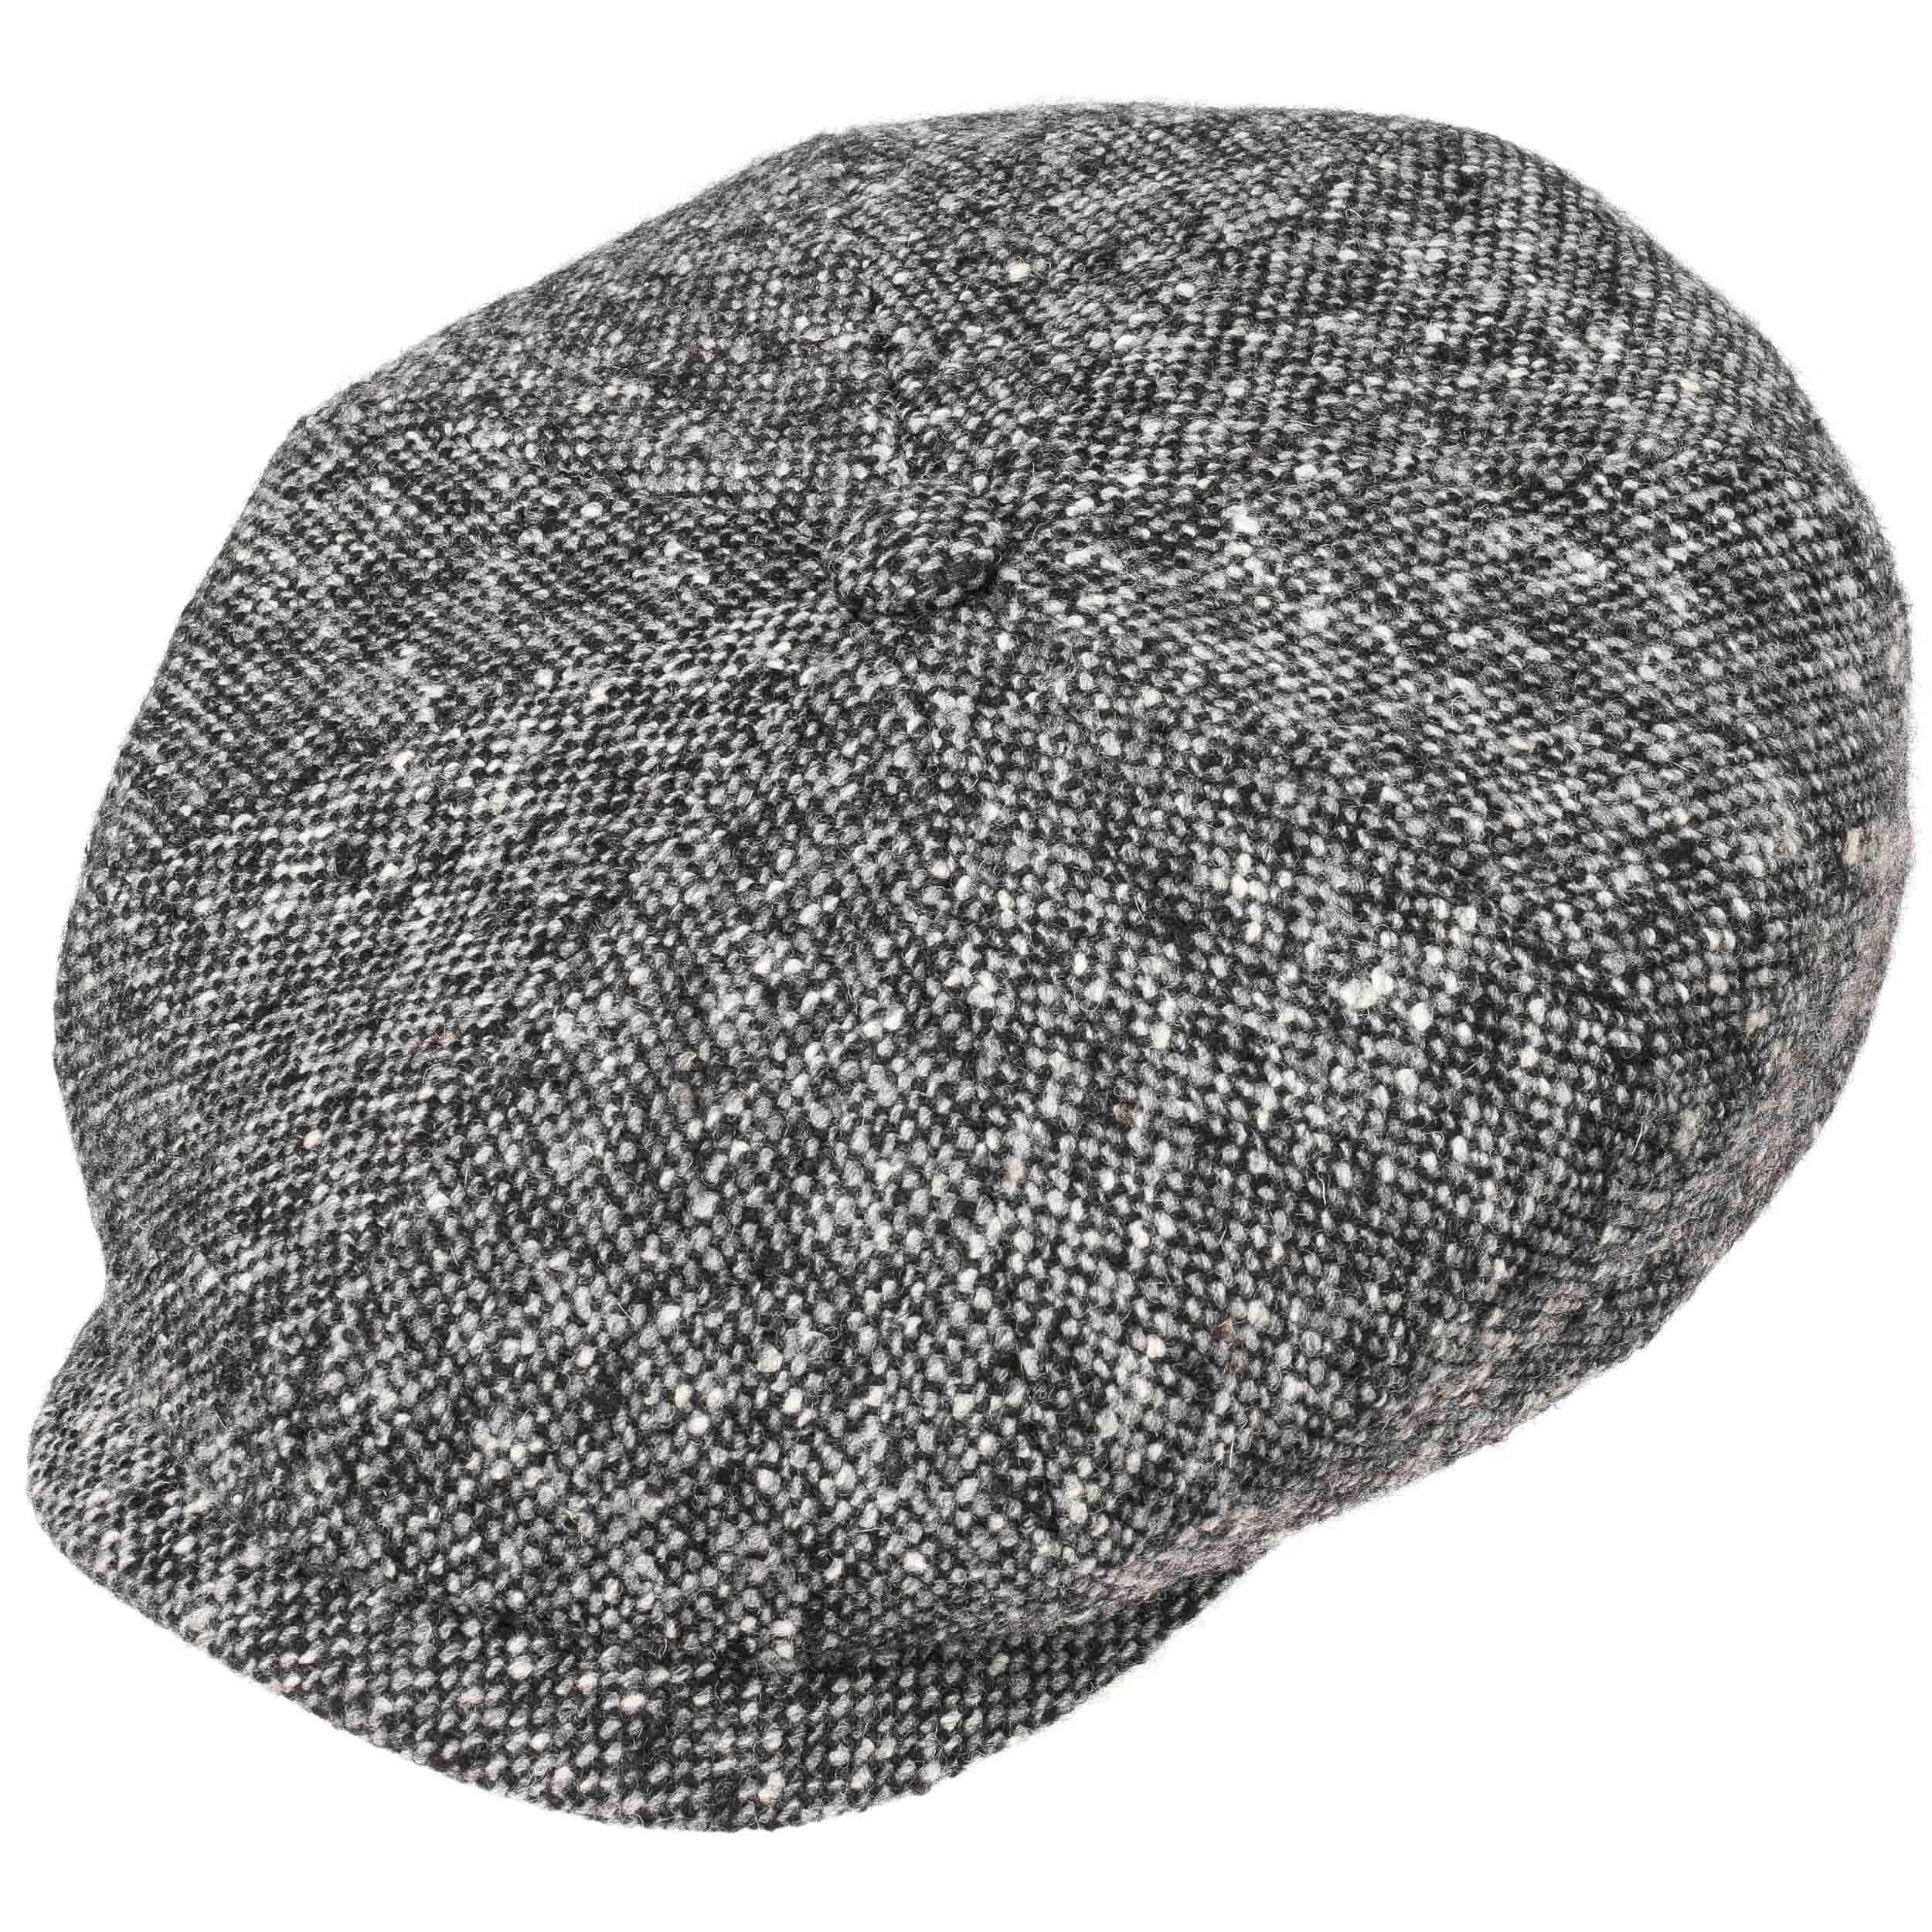 9ea4fcbc Hatteras Donegal Earflaps Cap by Stetson, GBP 99,00 --> Hats, caps ...